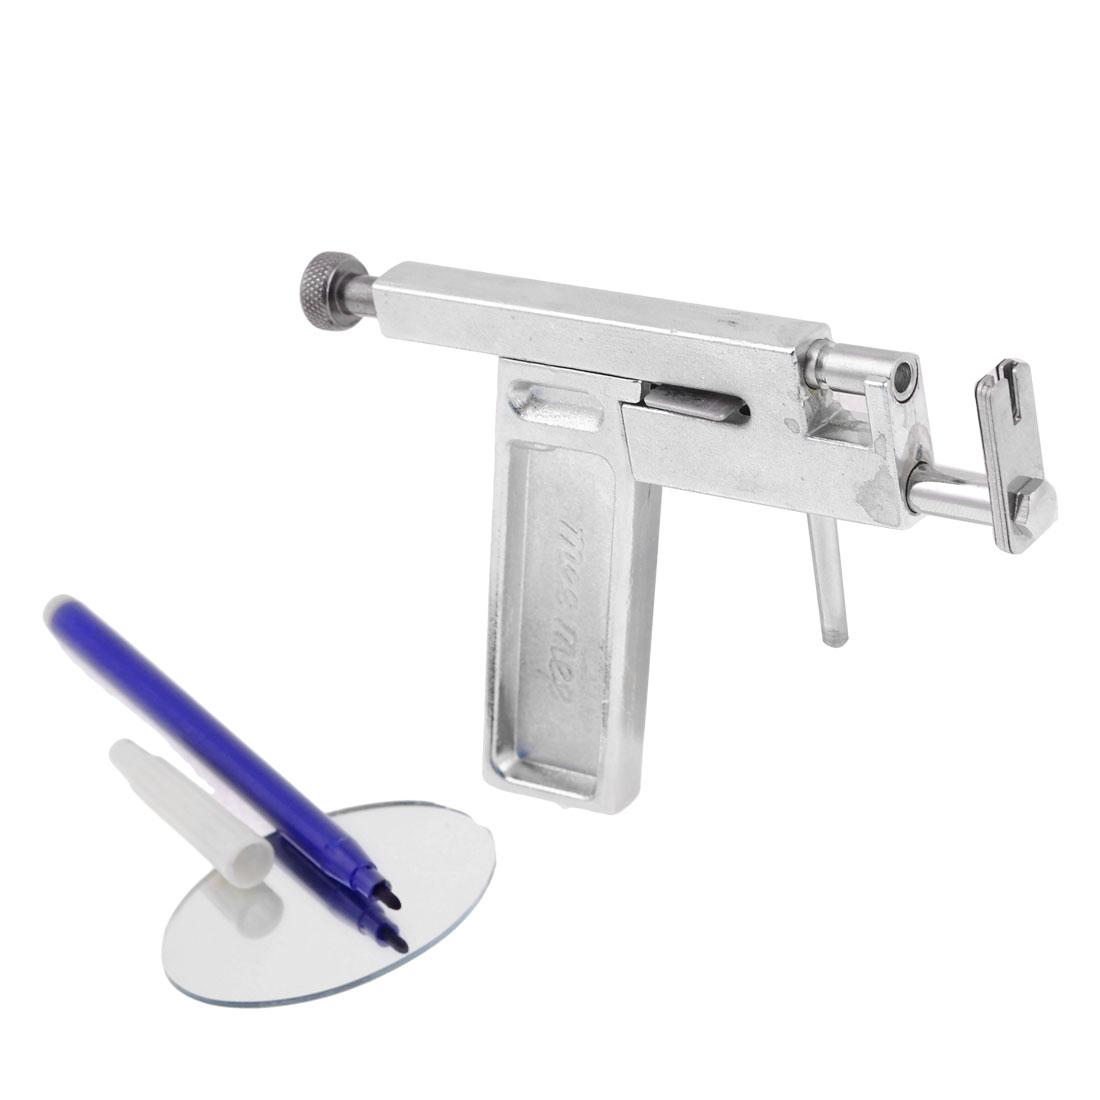 Metal Ear Lips Nose Navel Body Ring Hole Piercing Gun w Pen Silver Tone